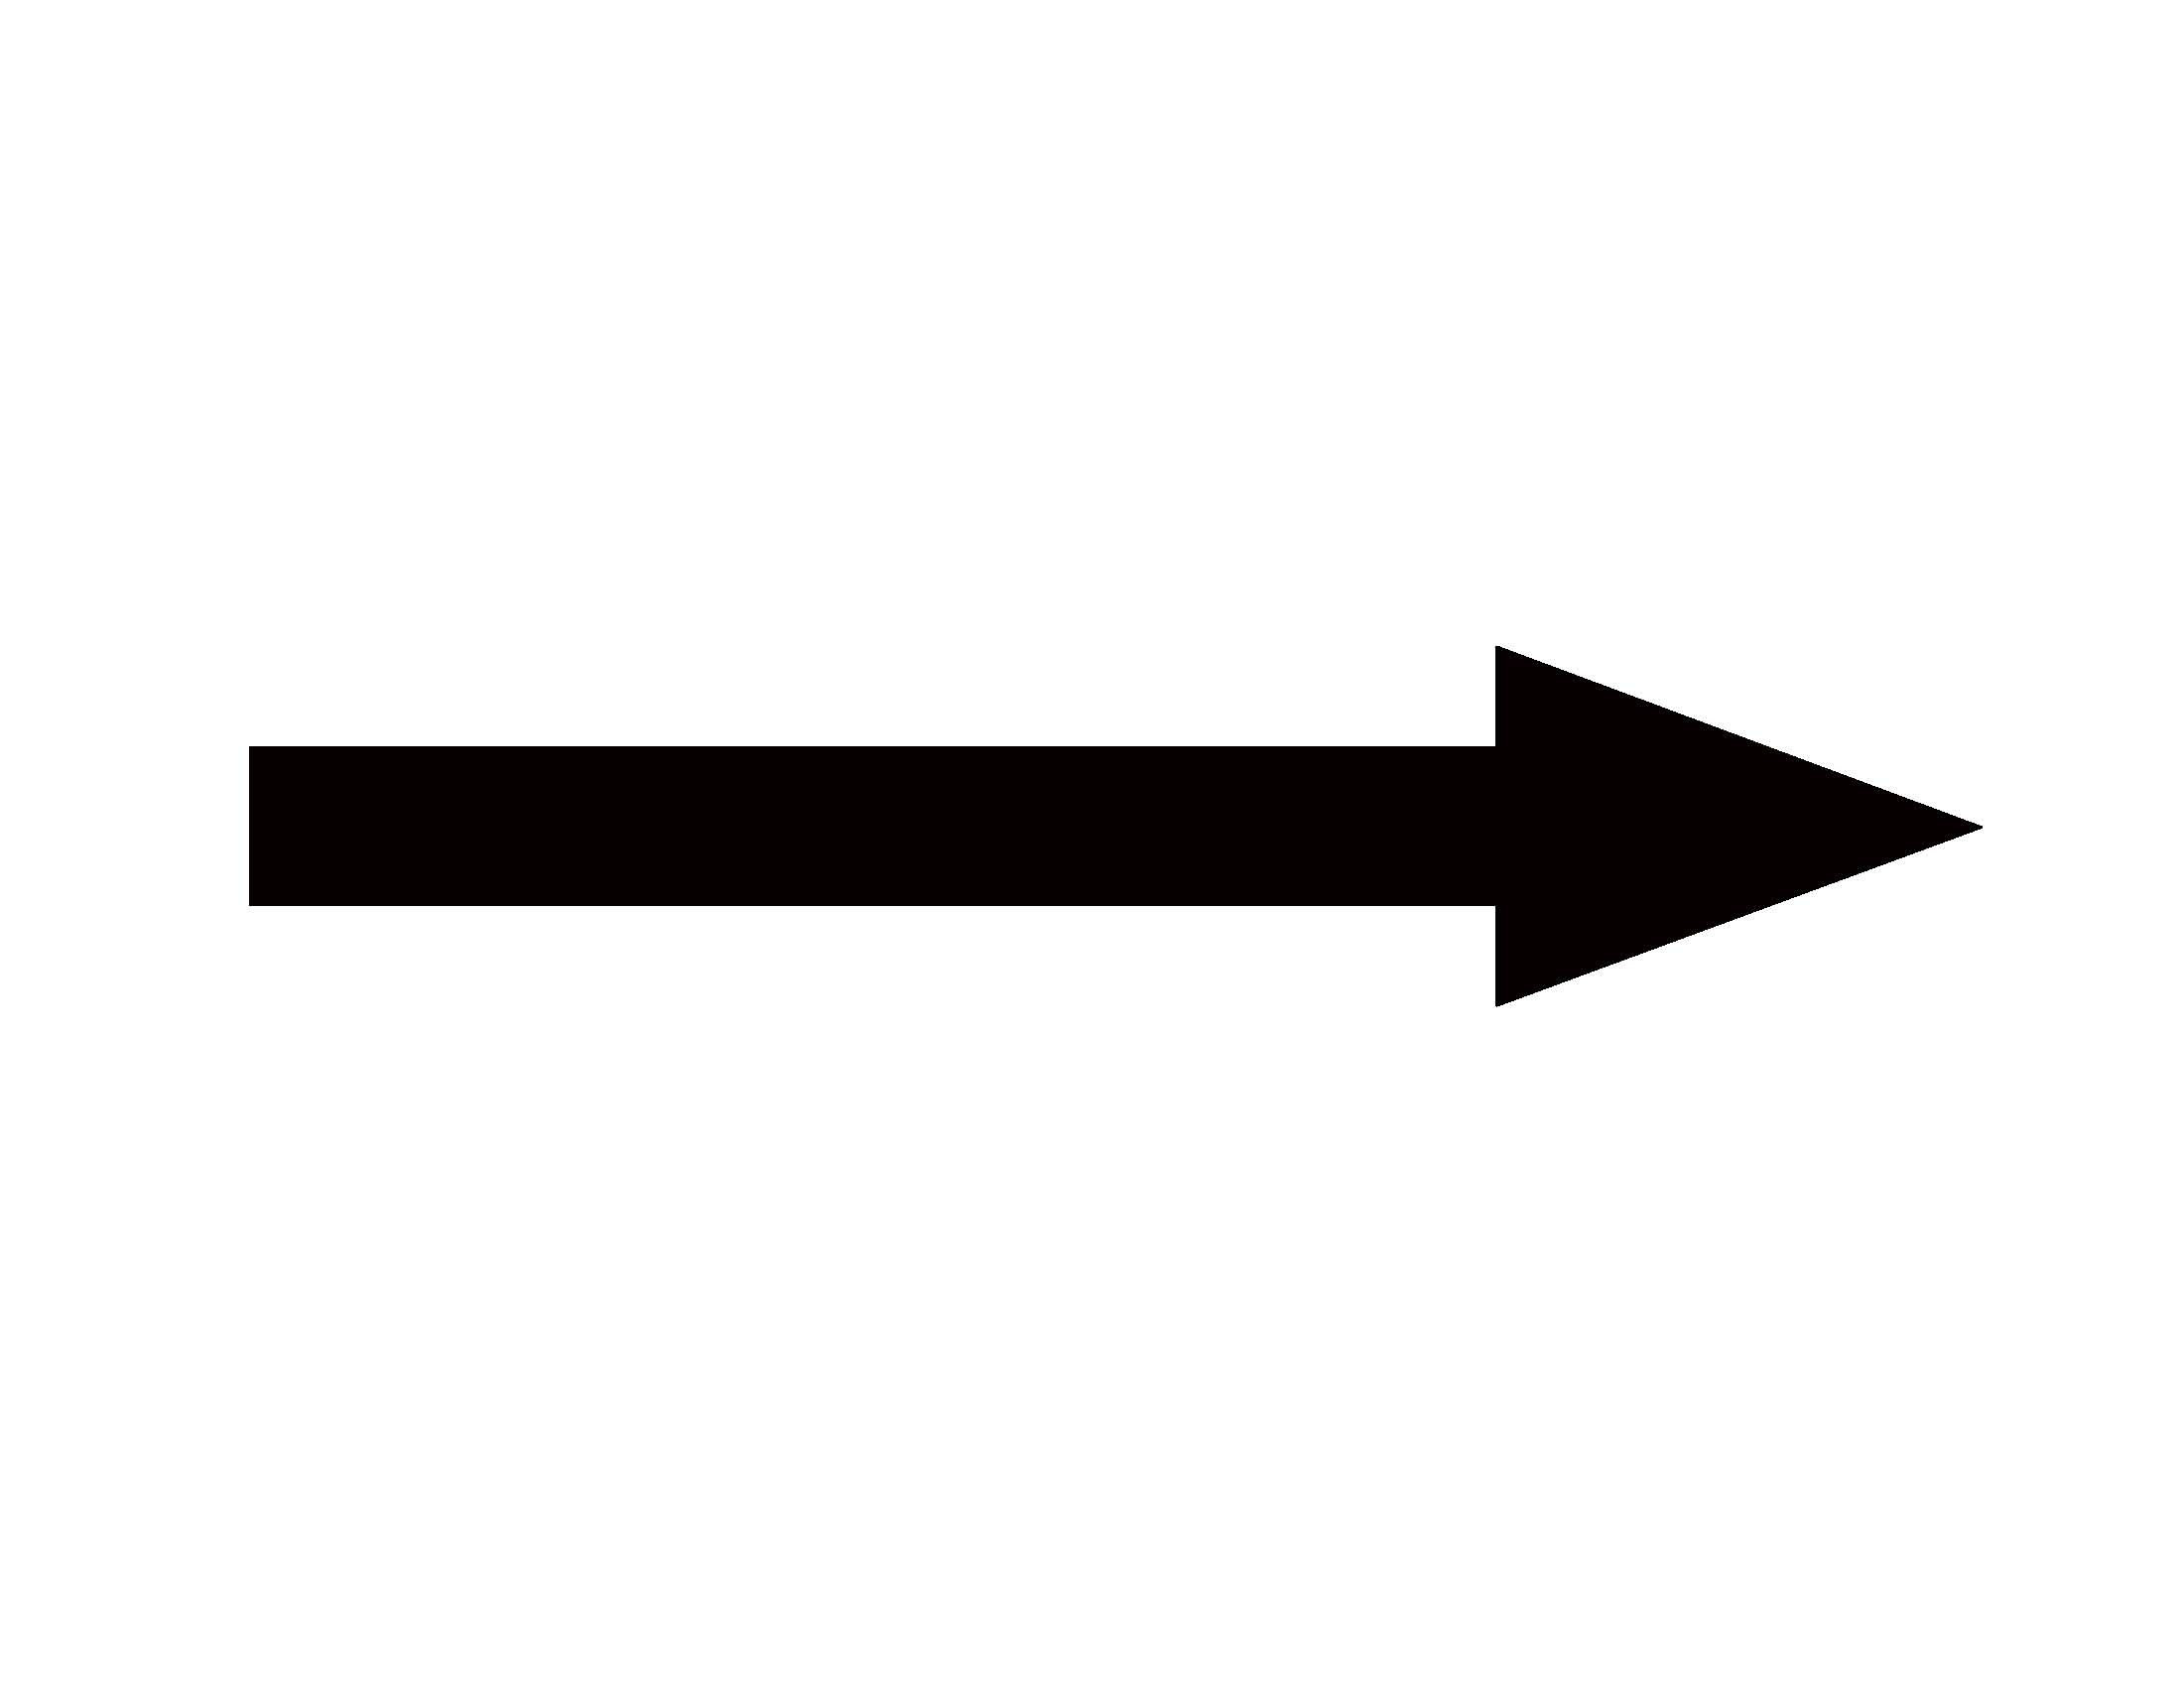 Clipart Arrows--0